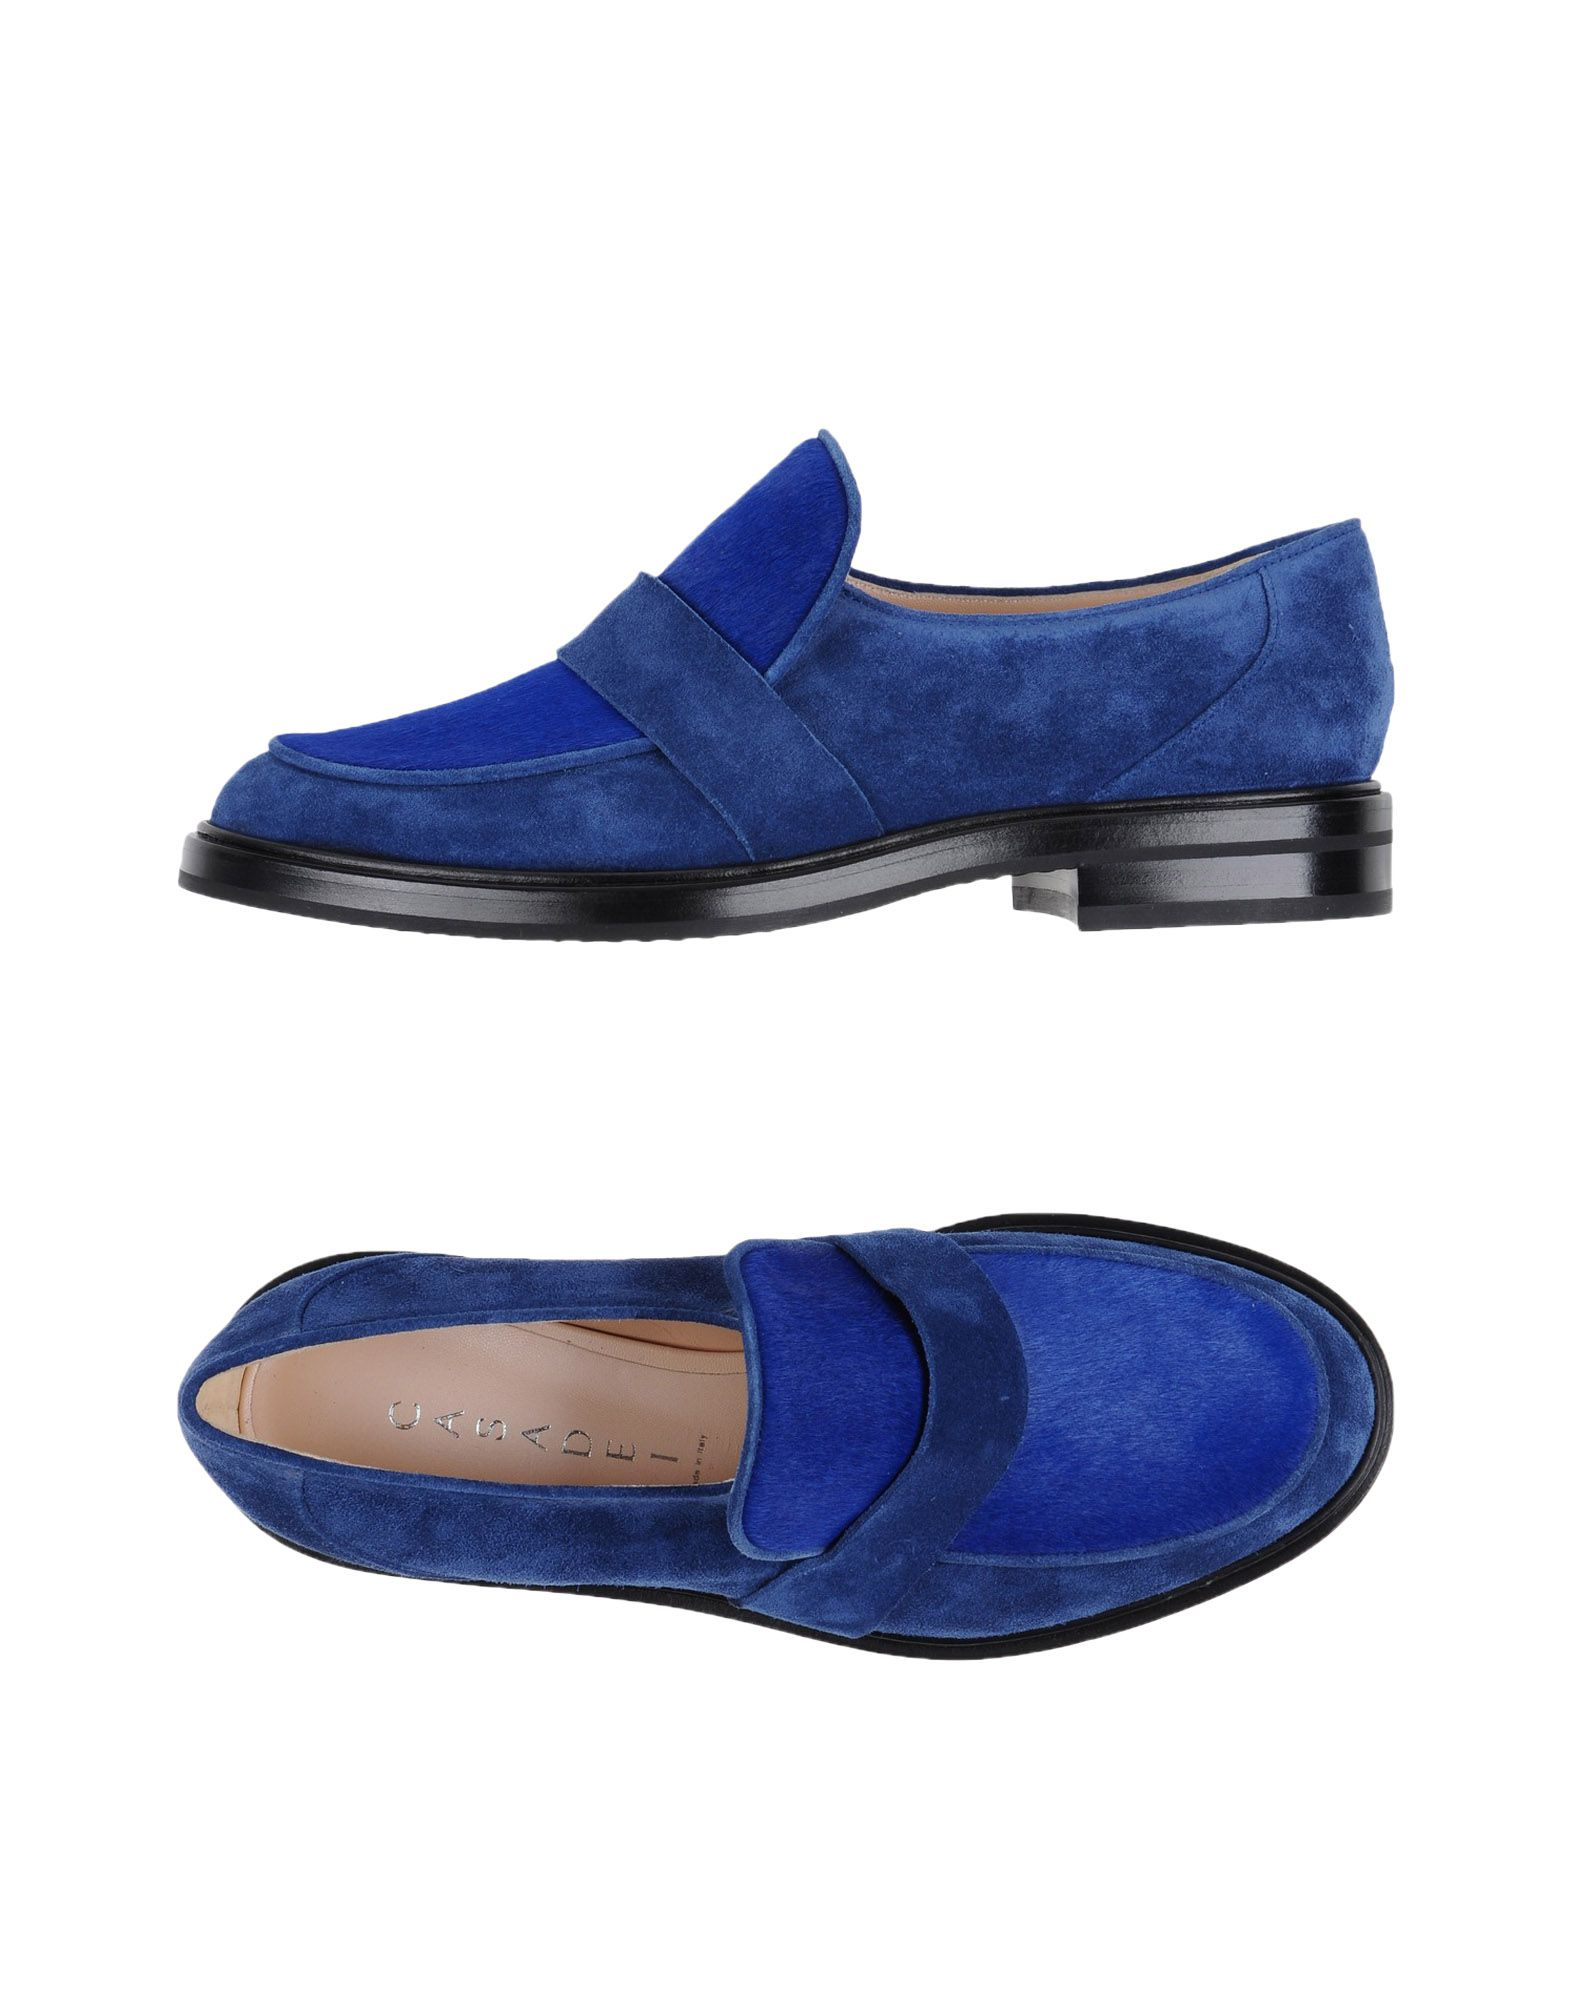 Stilvolle billige  Schuhe Casadei Mokassins Damen  billige 44991277FA 8f33b1